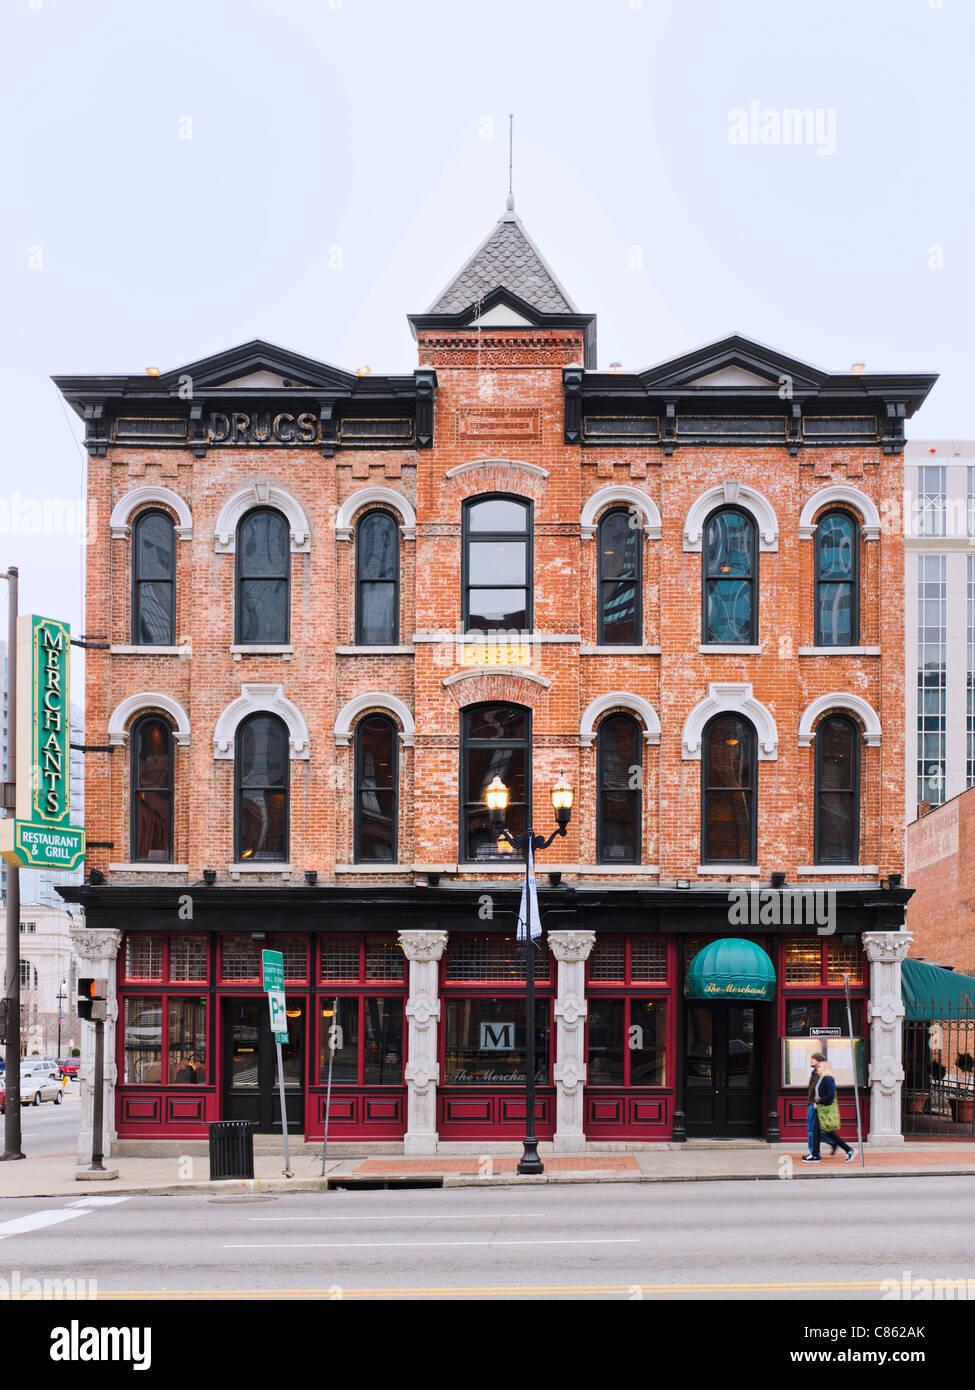 Merchants Restaurant & Grill, Nashville - Stock Image